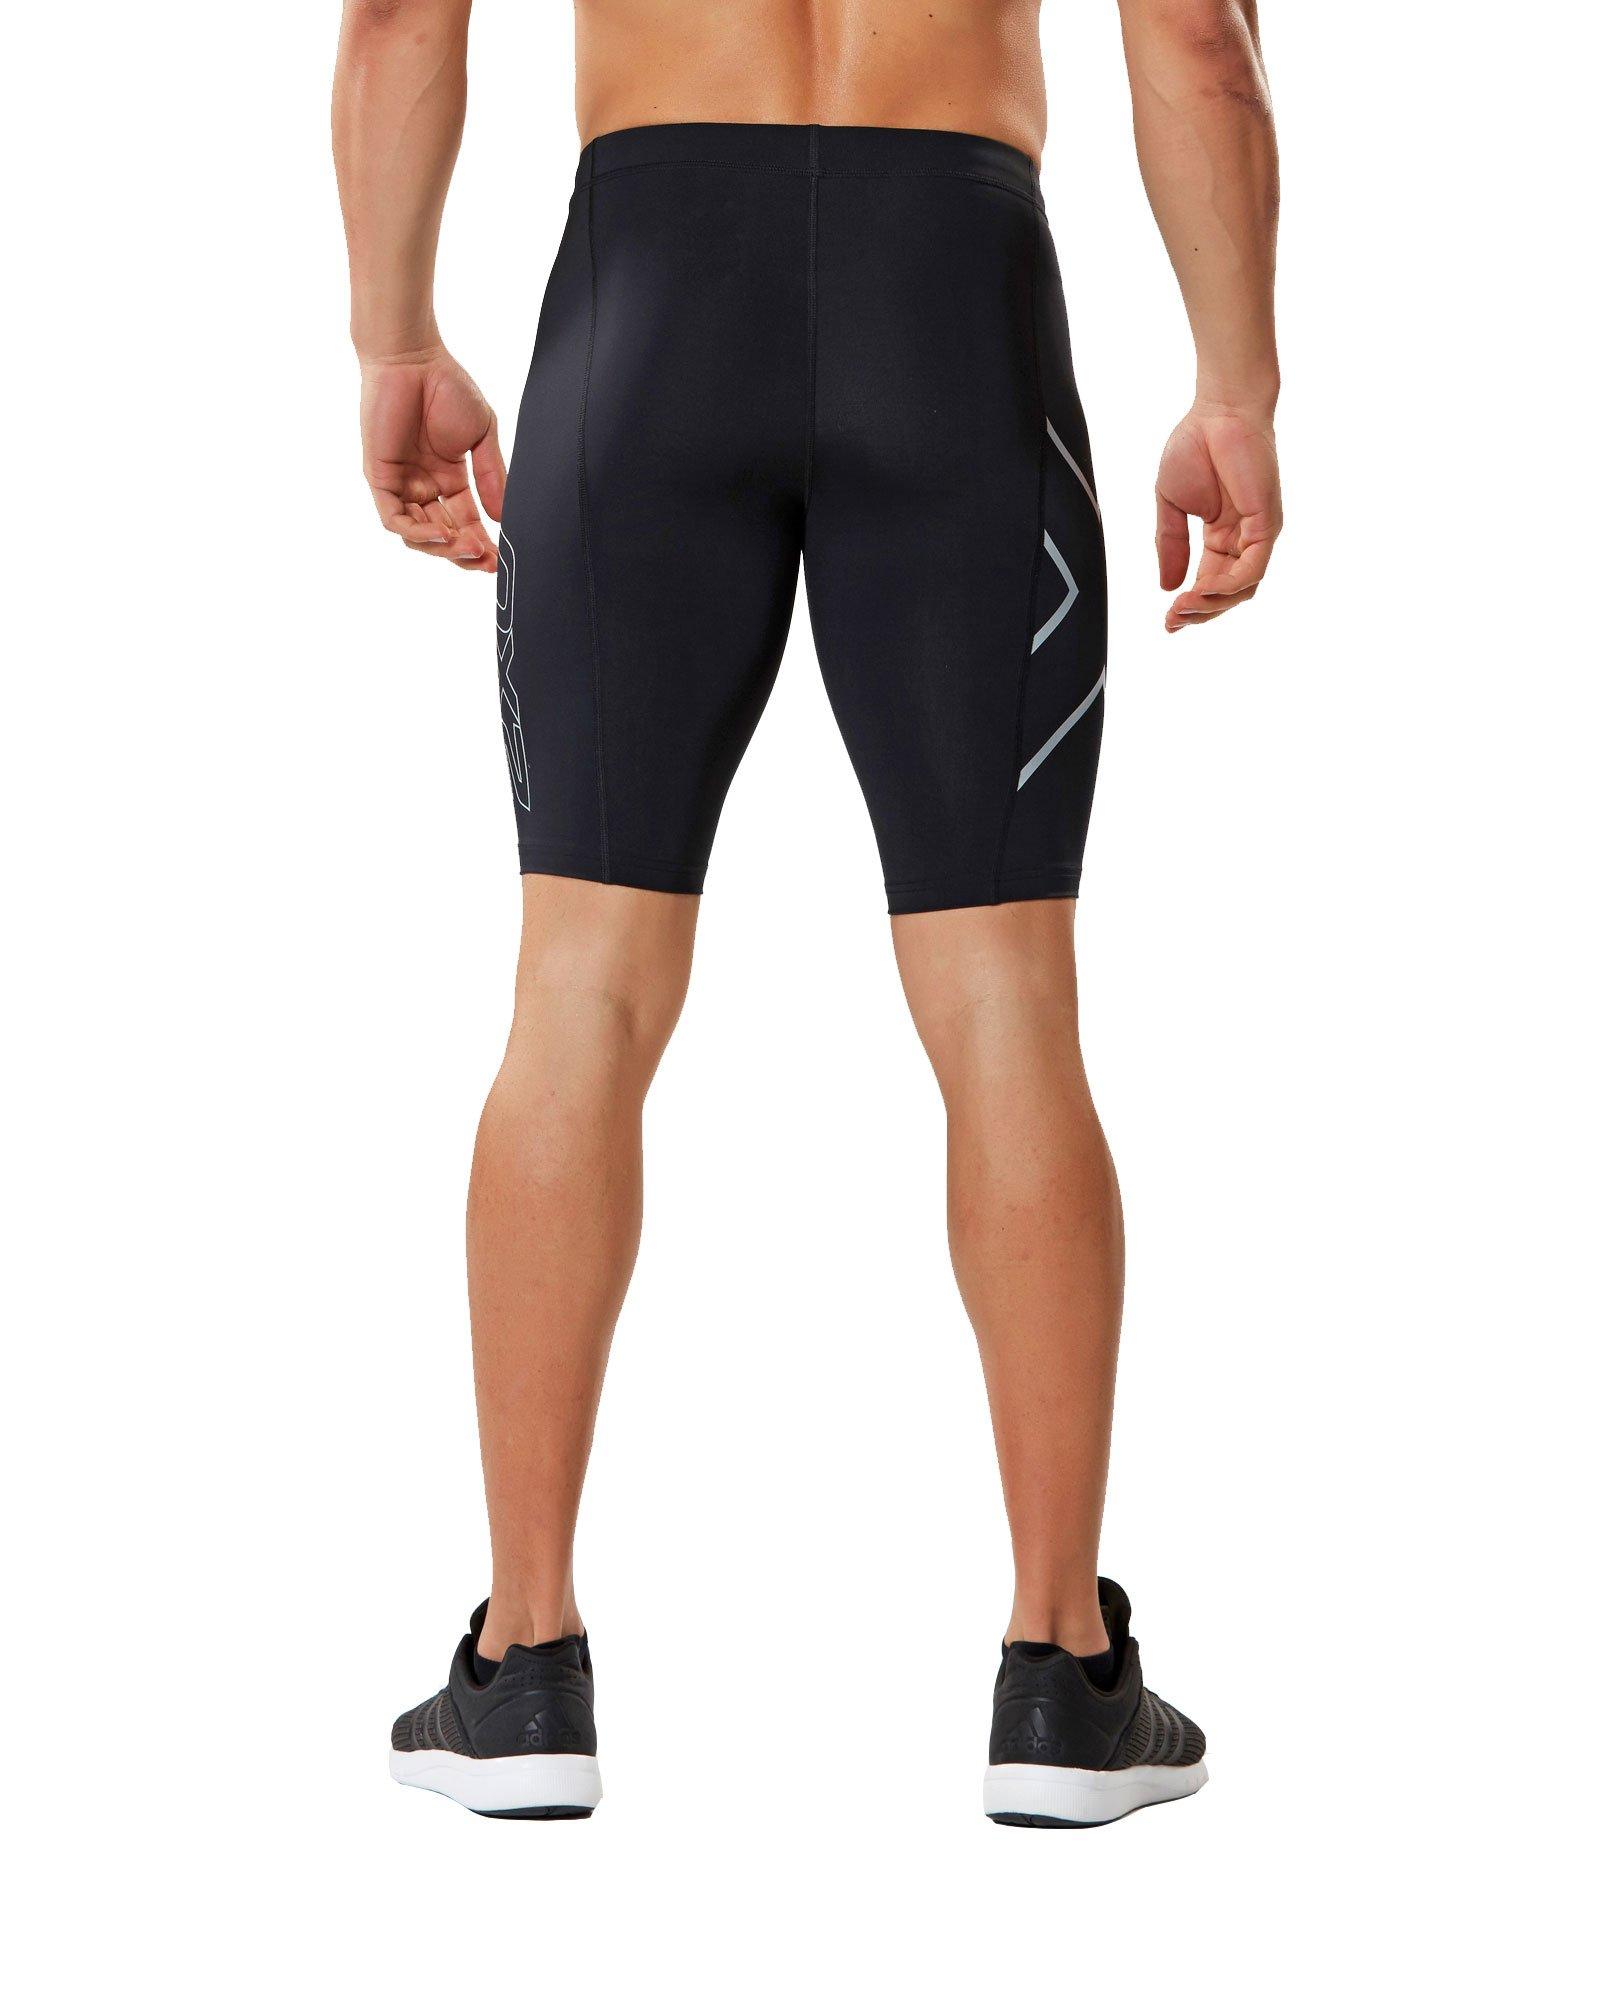 2XU Core Compression Shorts, Black/Silver, Medium by 2XU (Image #3)